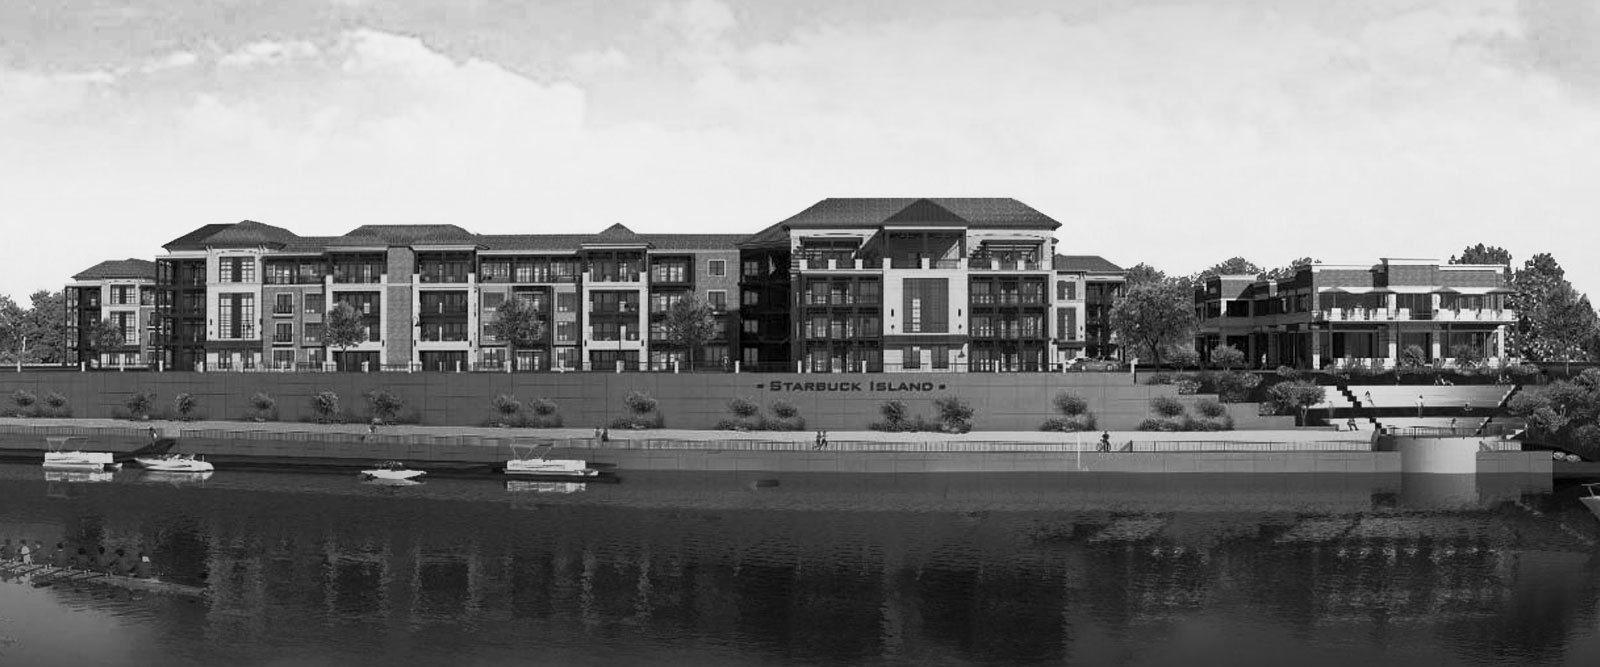 Rendering of Starbuck Island Luxury Apartments